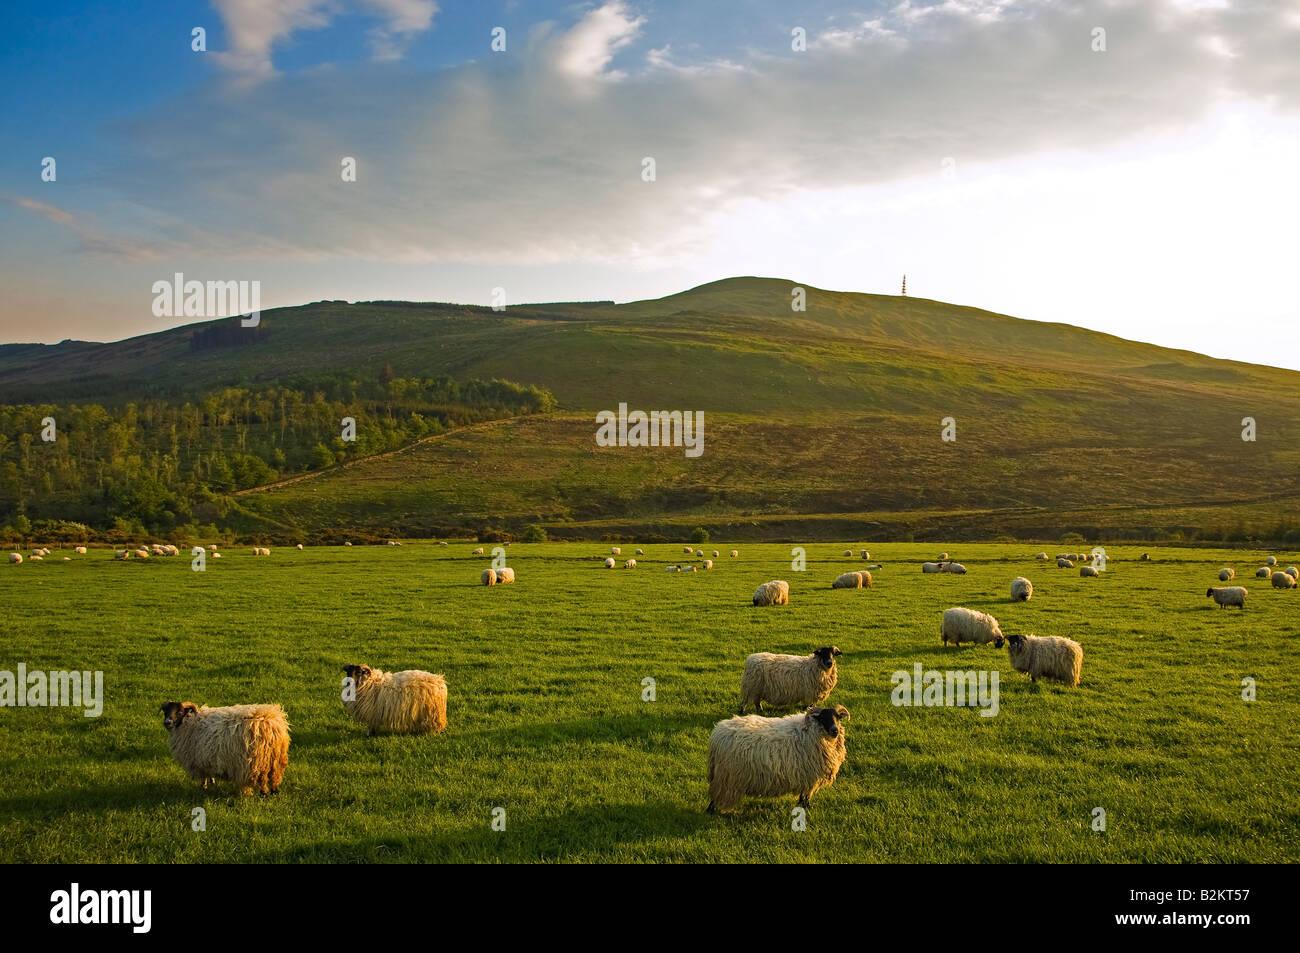 Sheep below Crohaun, Monavullagh Mountains, County Waterford, Ireland - Stock Image